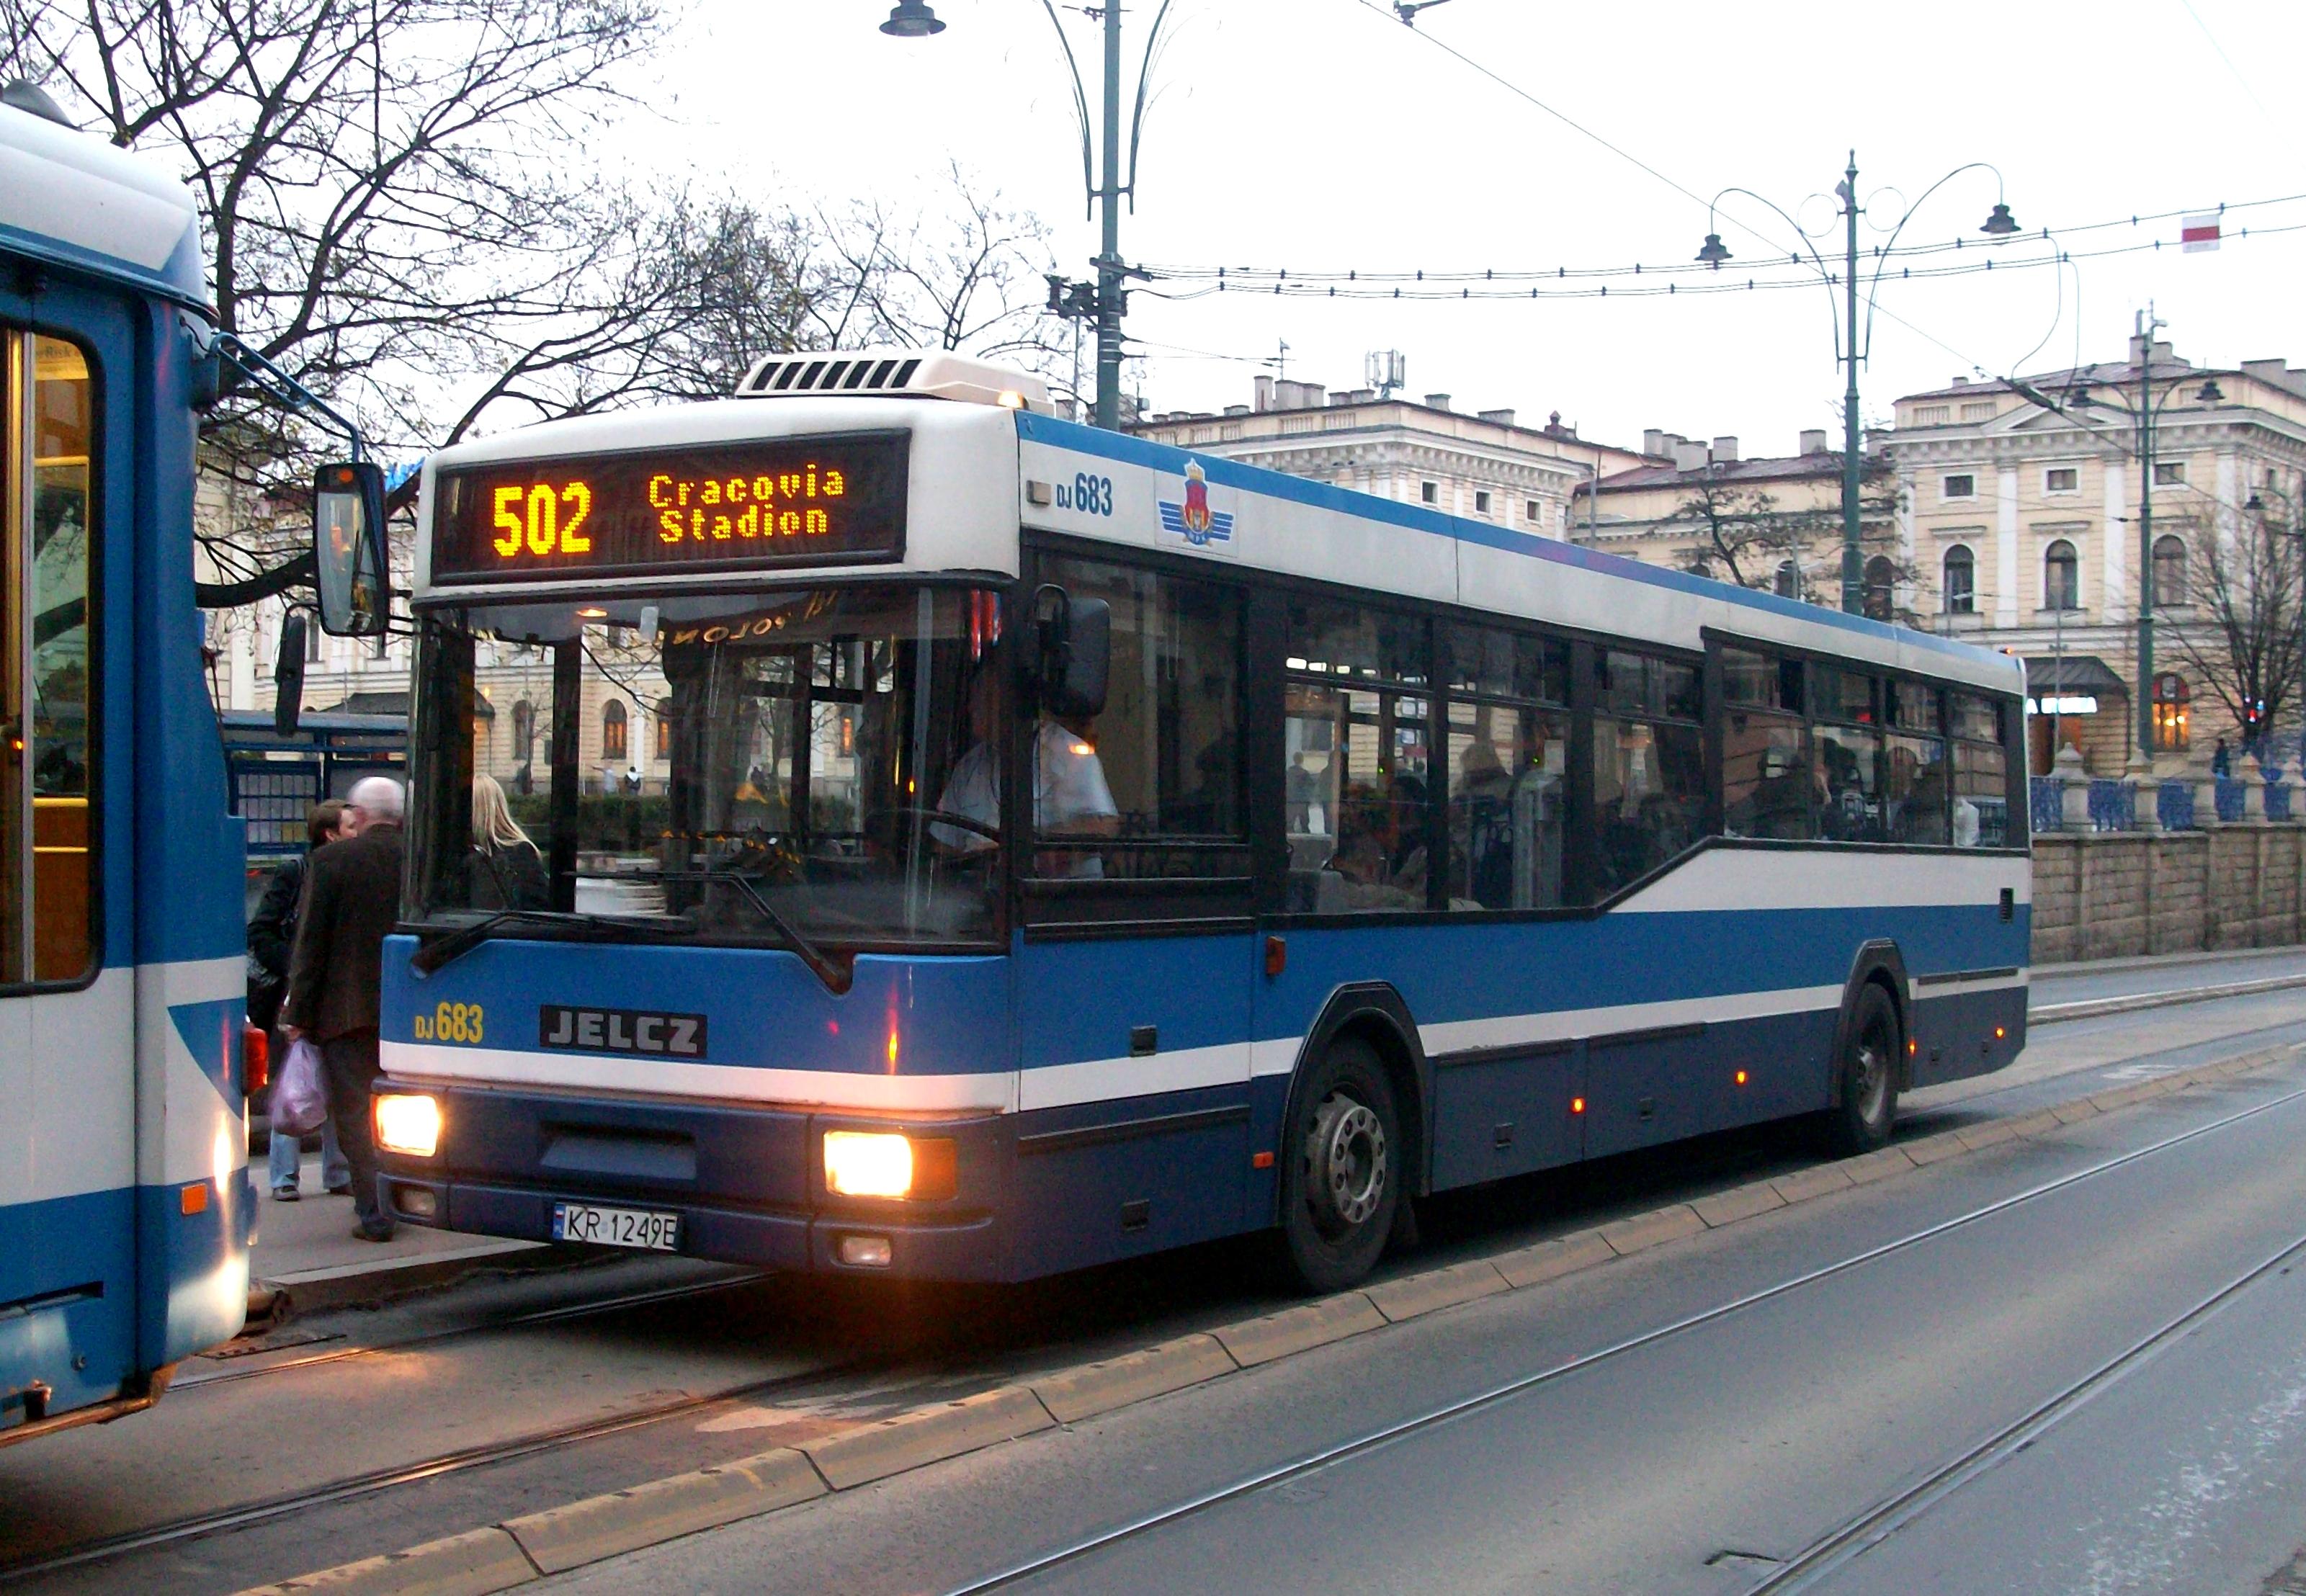 Jelcz_MPK_Krakow_line_502.JPG